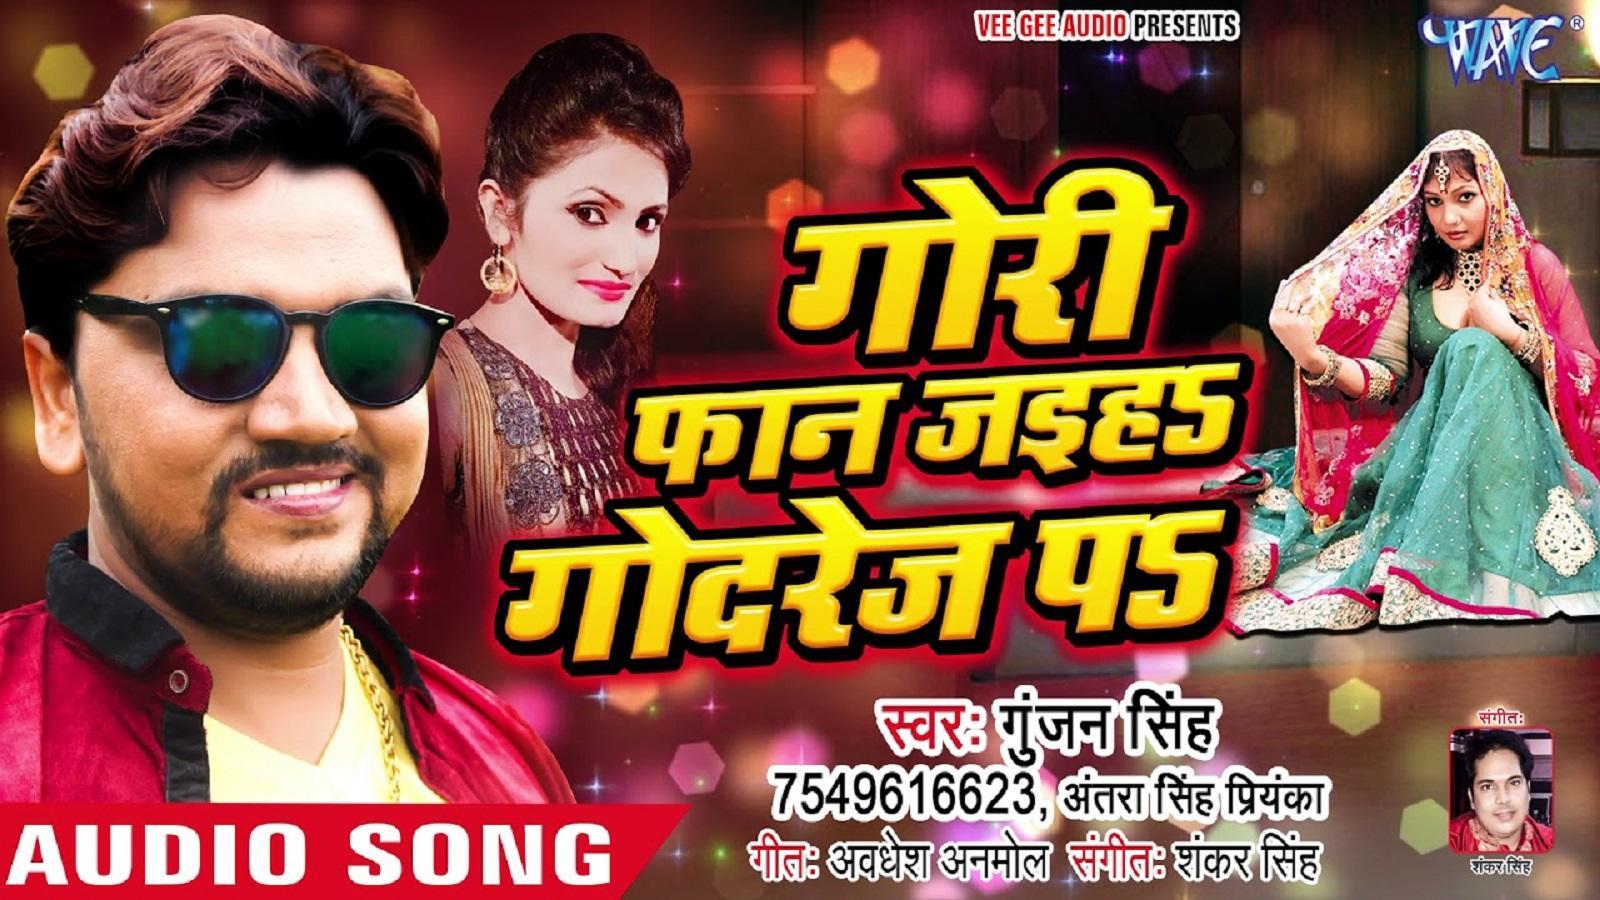 Latest Bhojpuri Song 'Gori Faan Jaiha Godrej Pa' sung by Gunjan Singh and  Antra Singh Priyanka | Bhojpuri Video Songs - Times of India